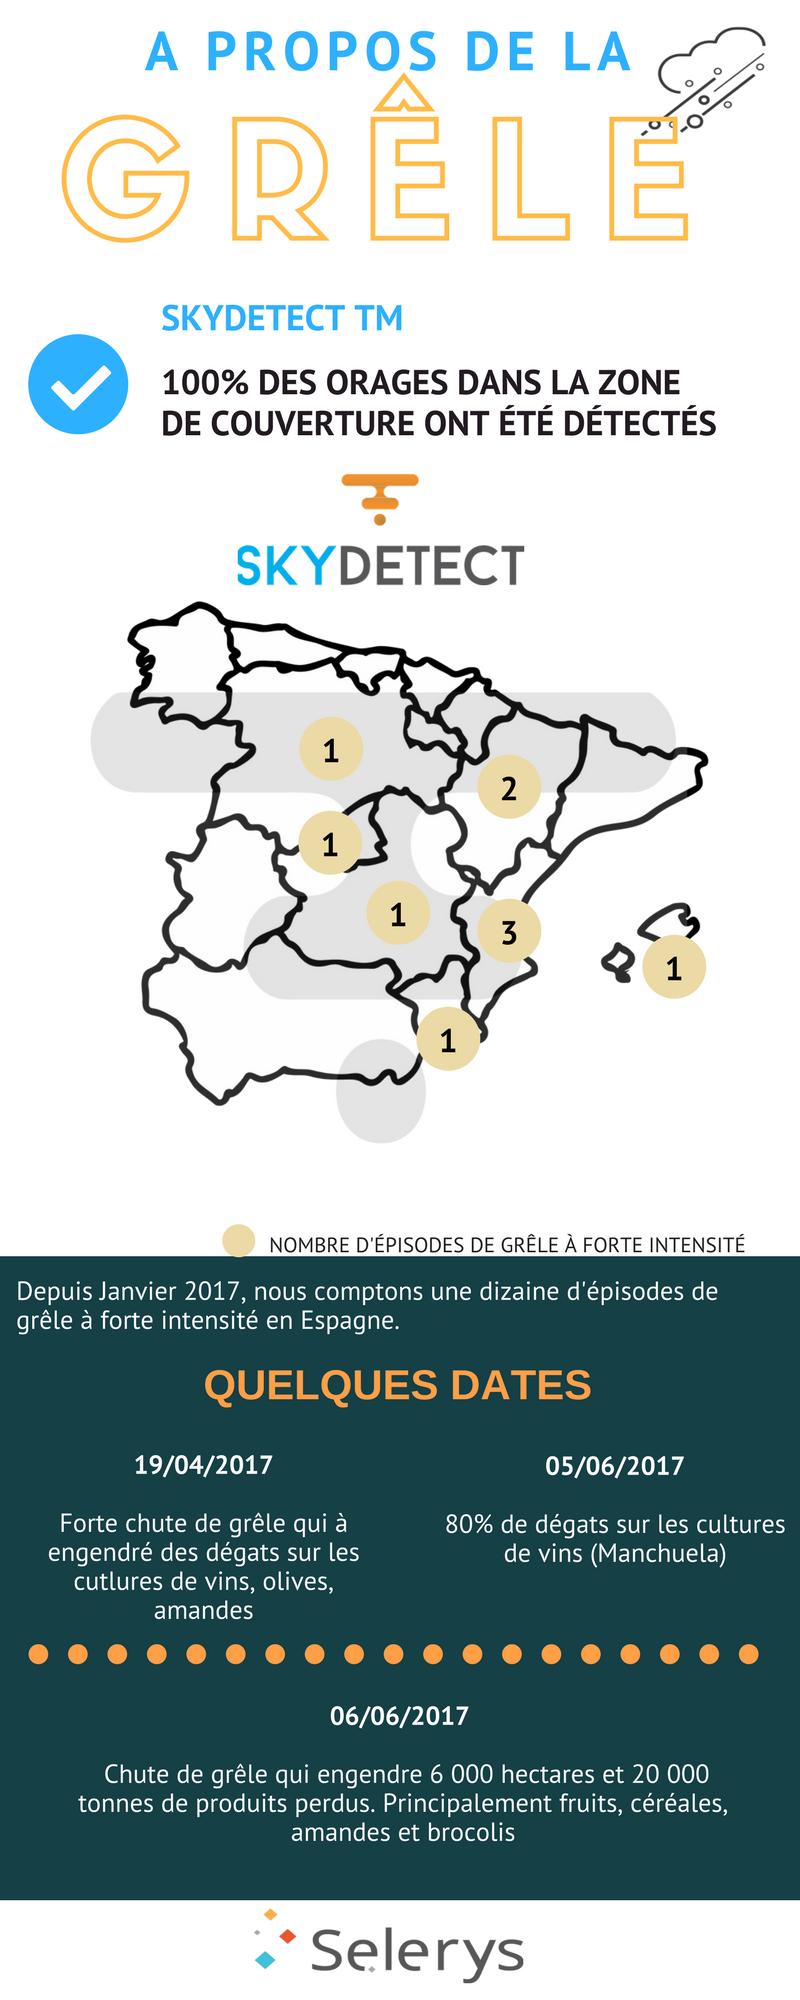 infographie-espagne-1er-semestre-2017-version-francaise